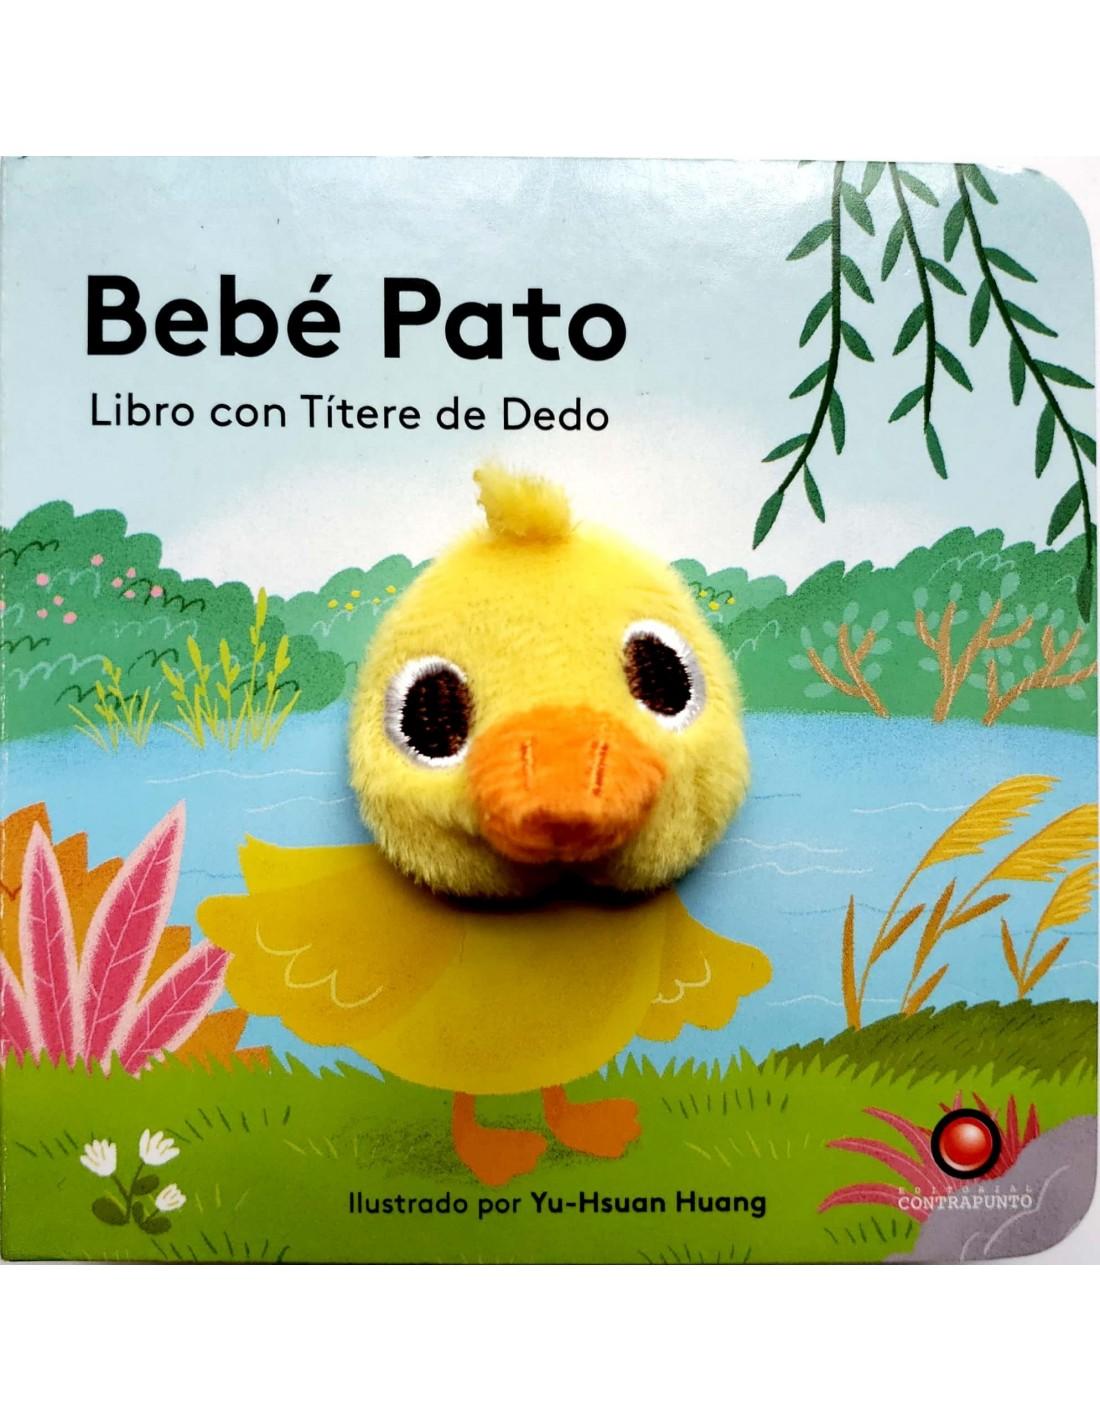 BEBE PATO LIBRO CON TITERE DE DEDO